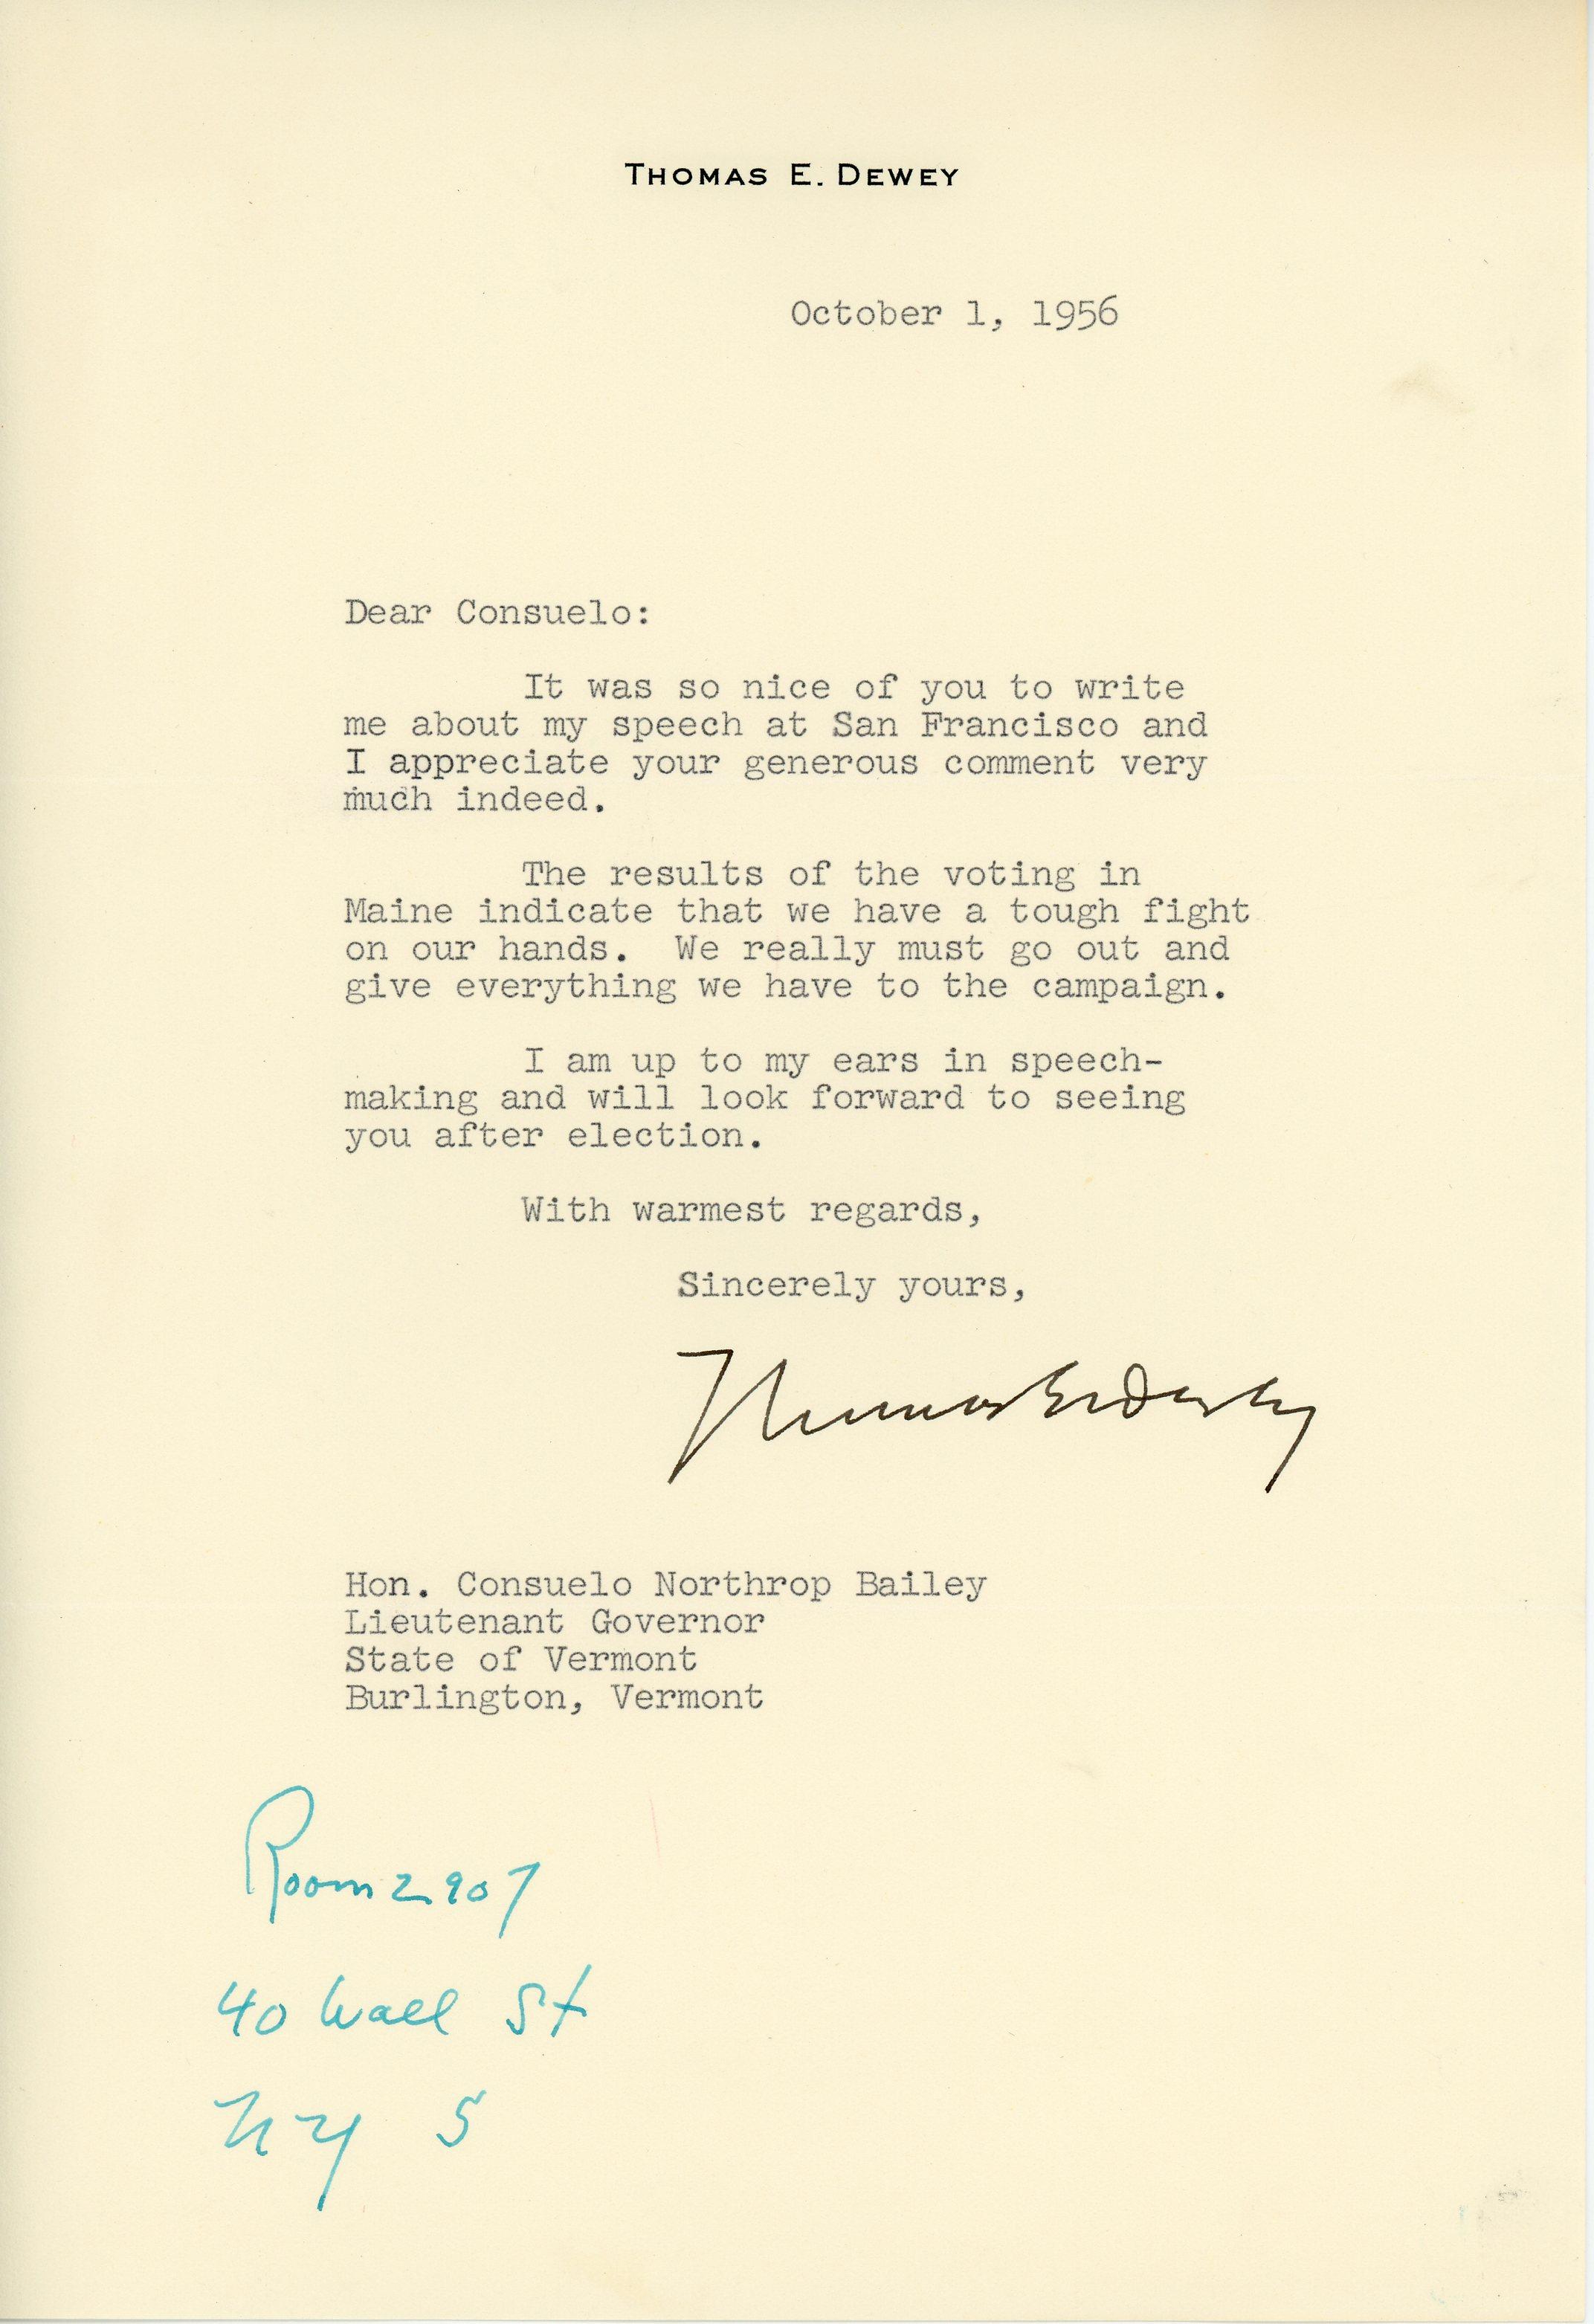 Letter from Thomas Dewey to Consuelo Northrop Bailey, 1956 October 1